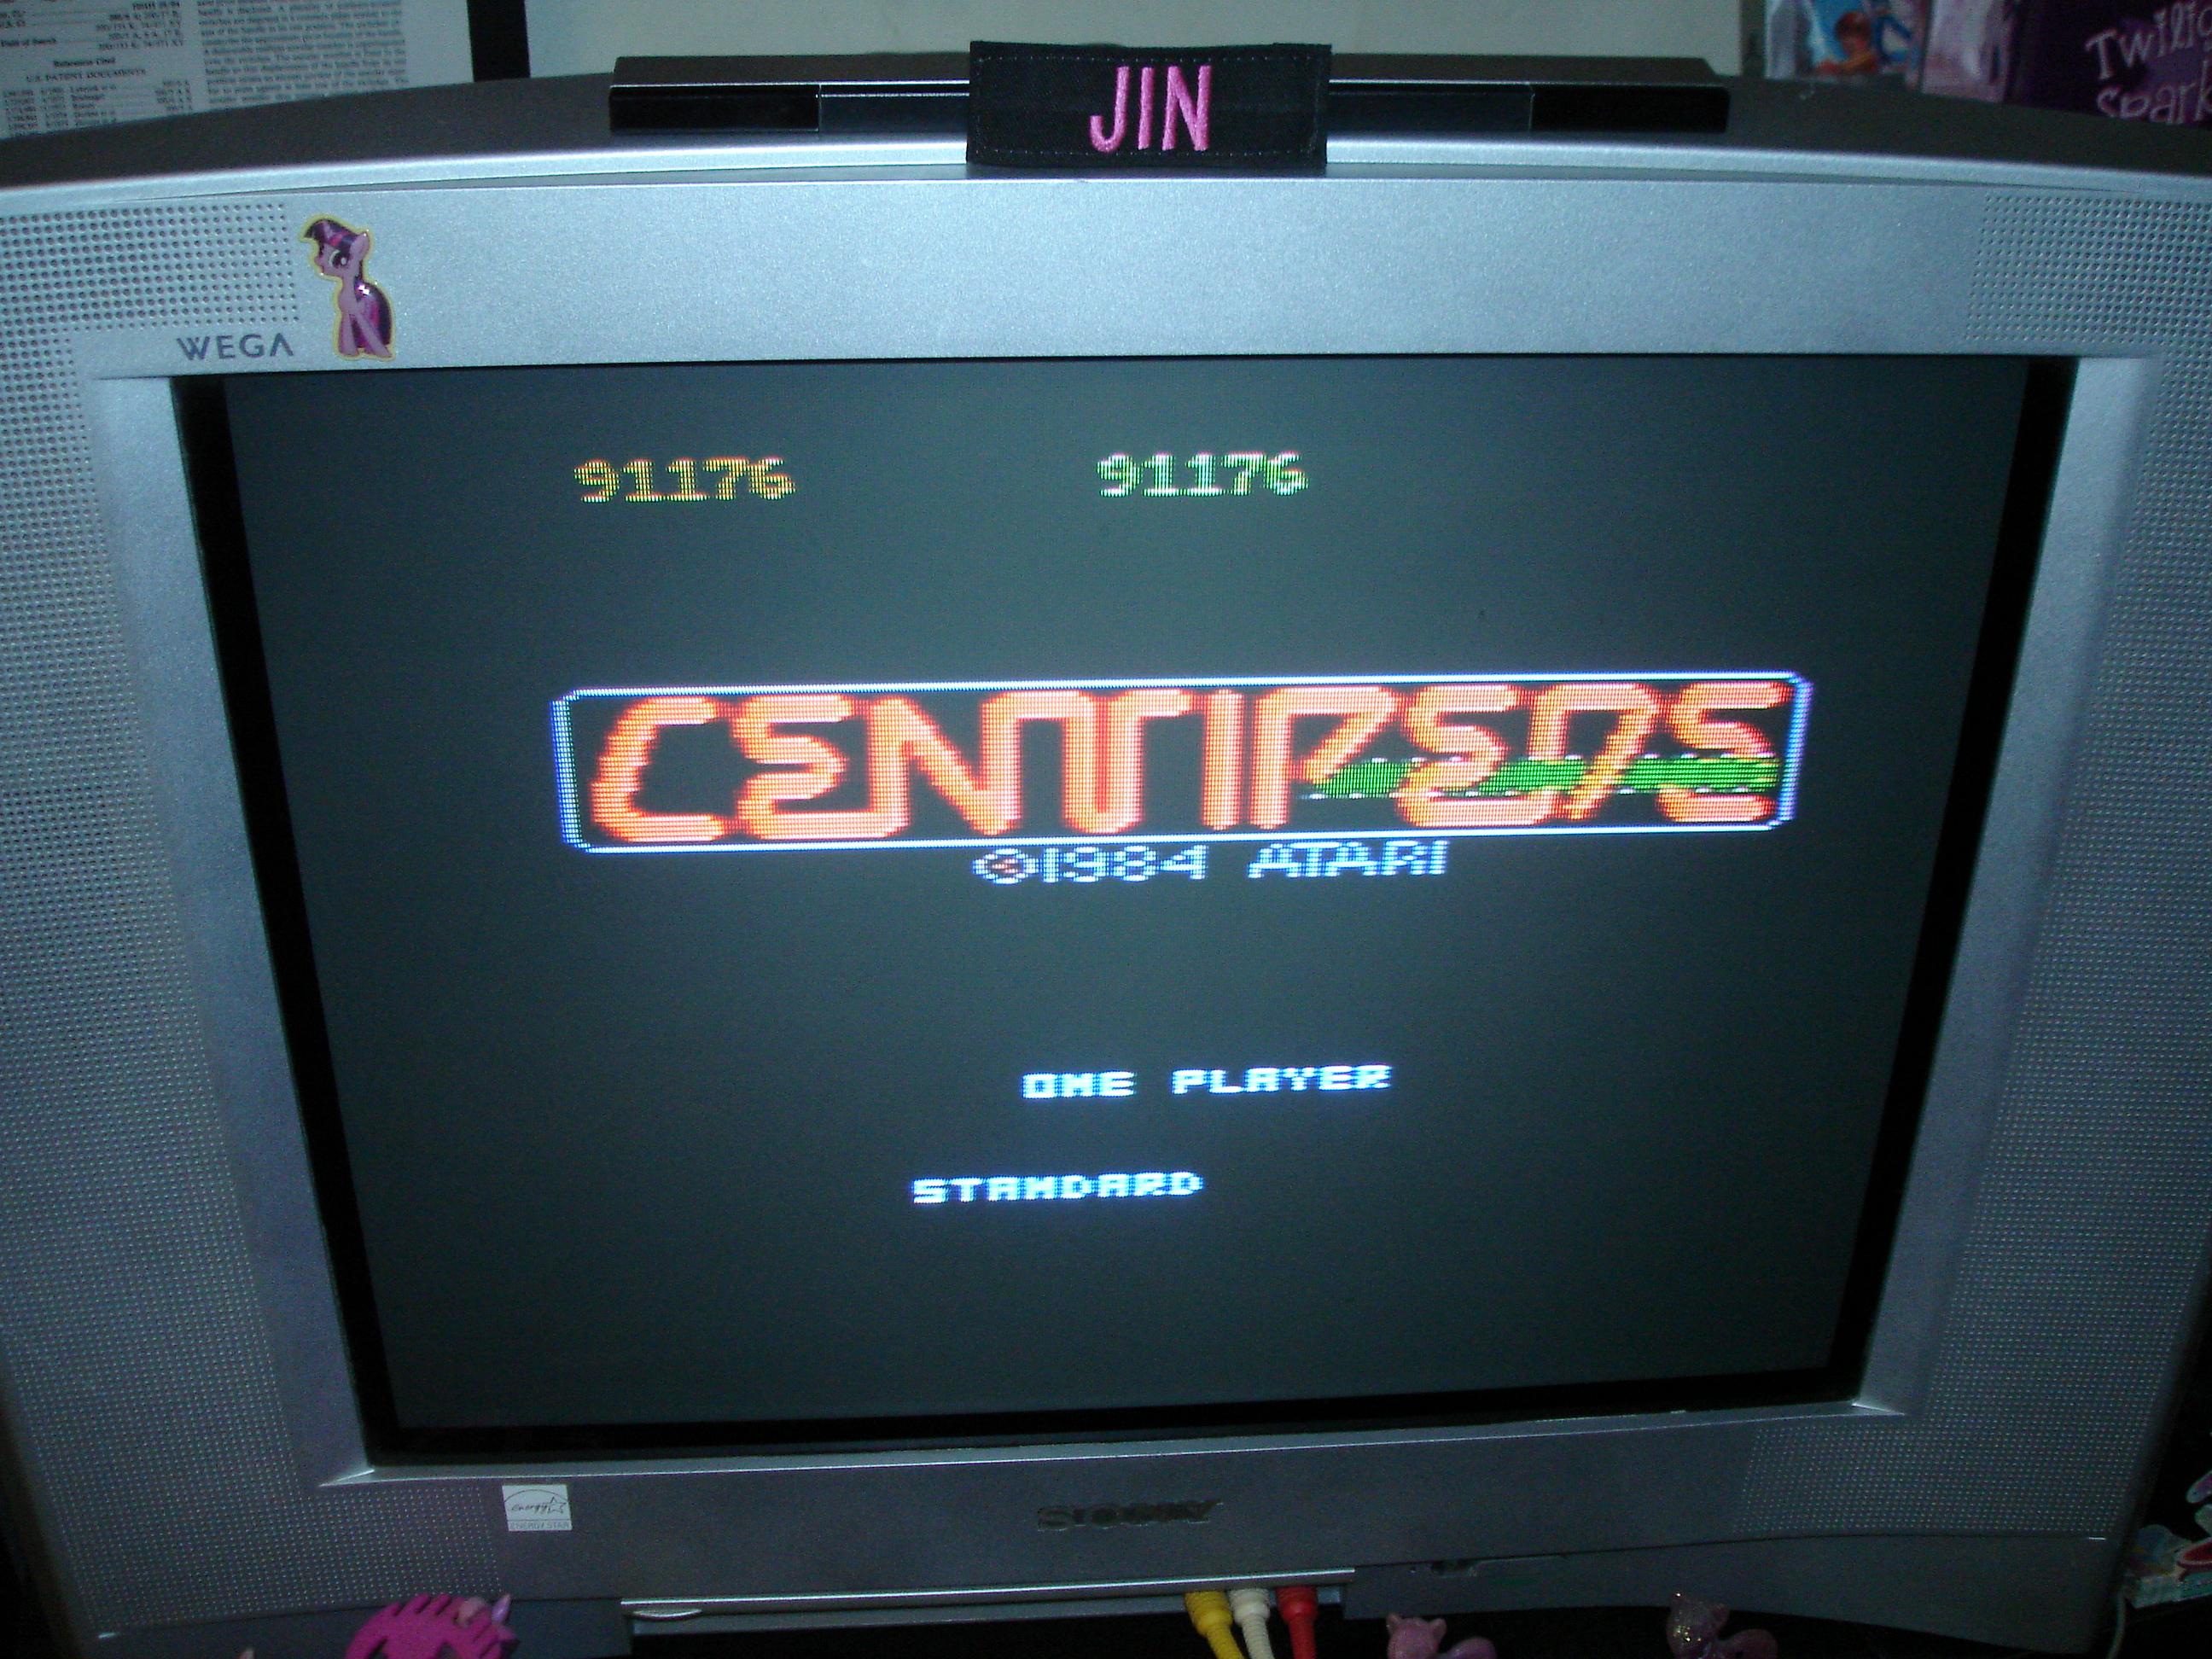 Centipede: Standard 91,176 points